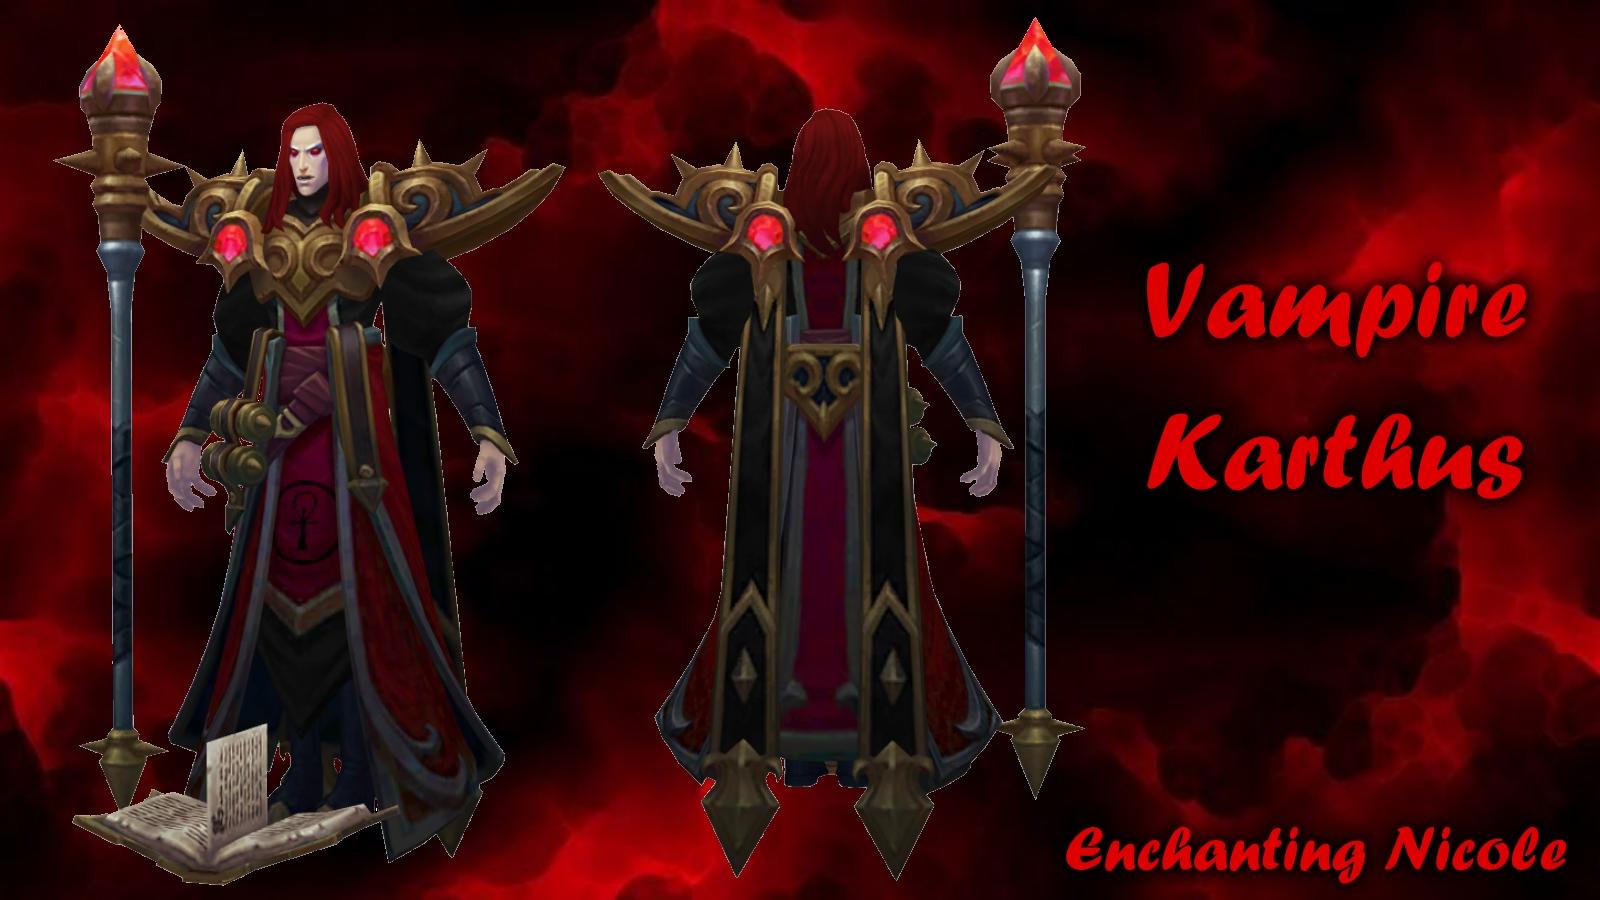 Vampire Karthus